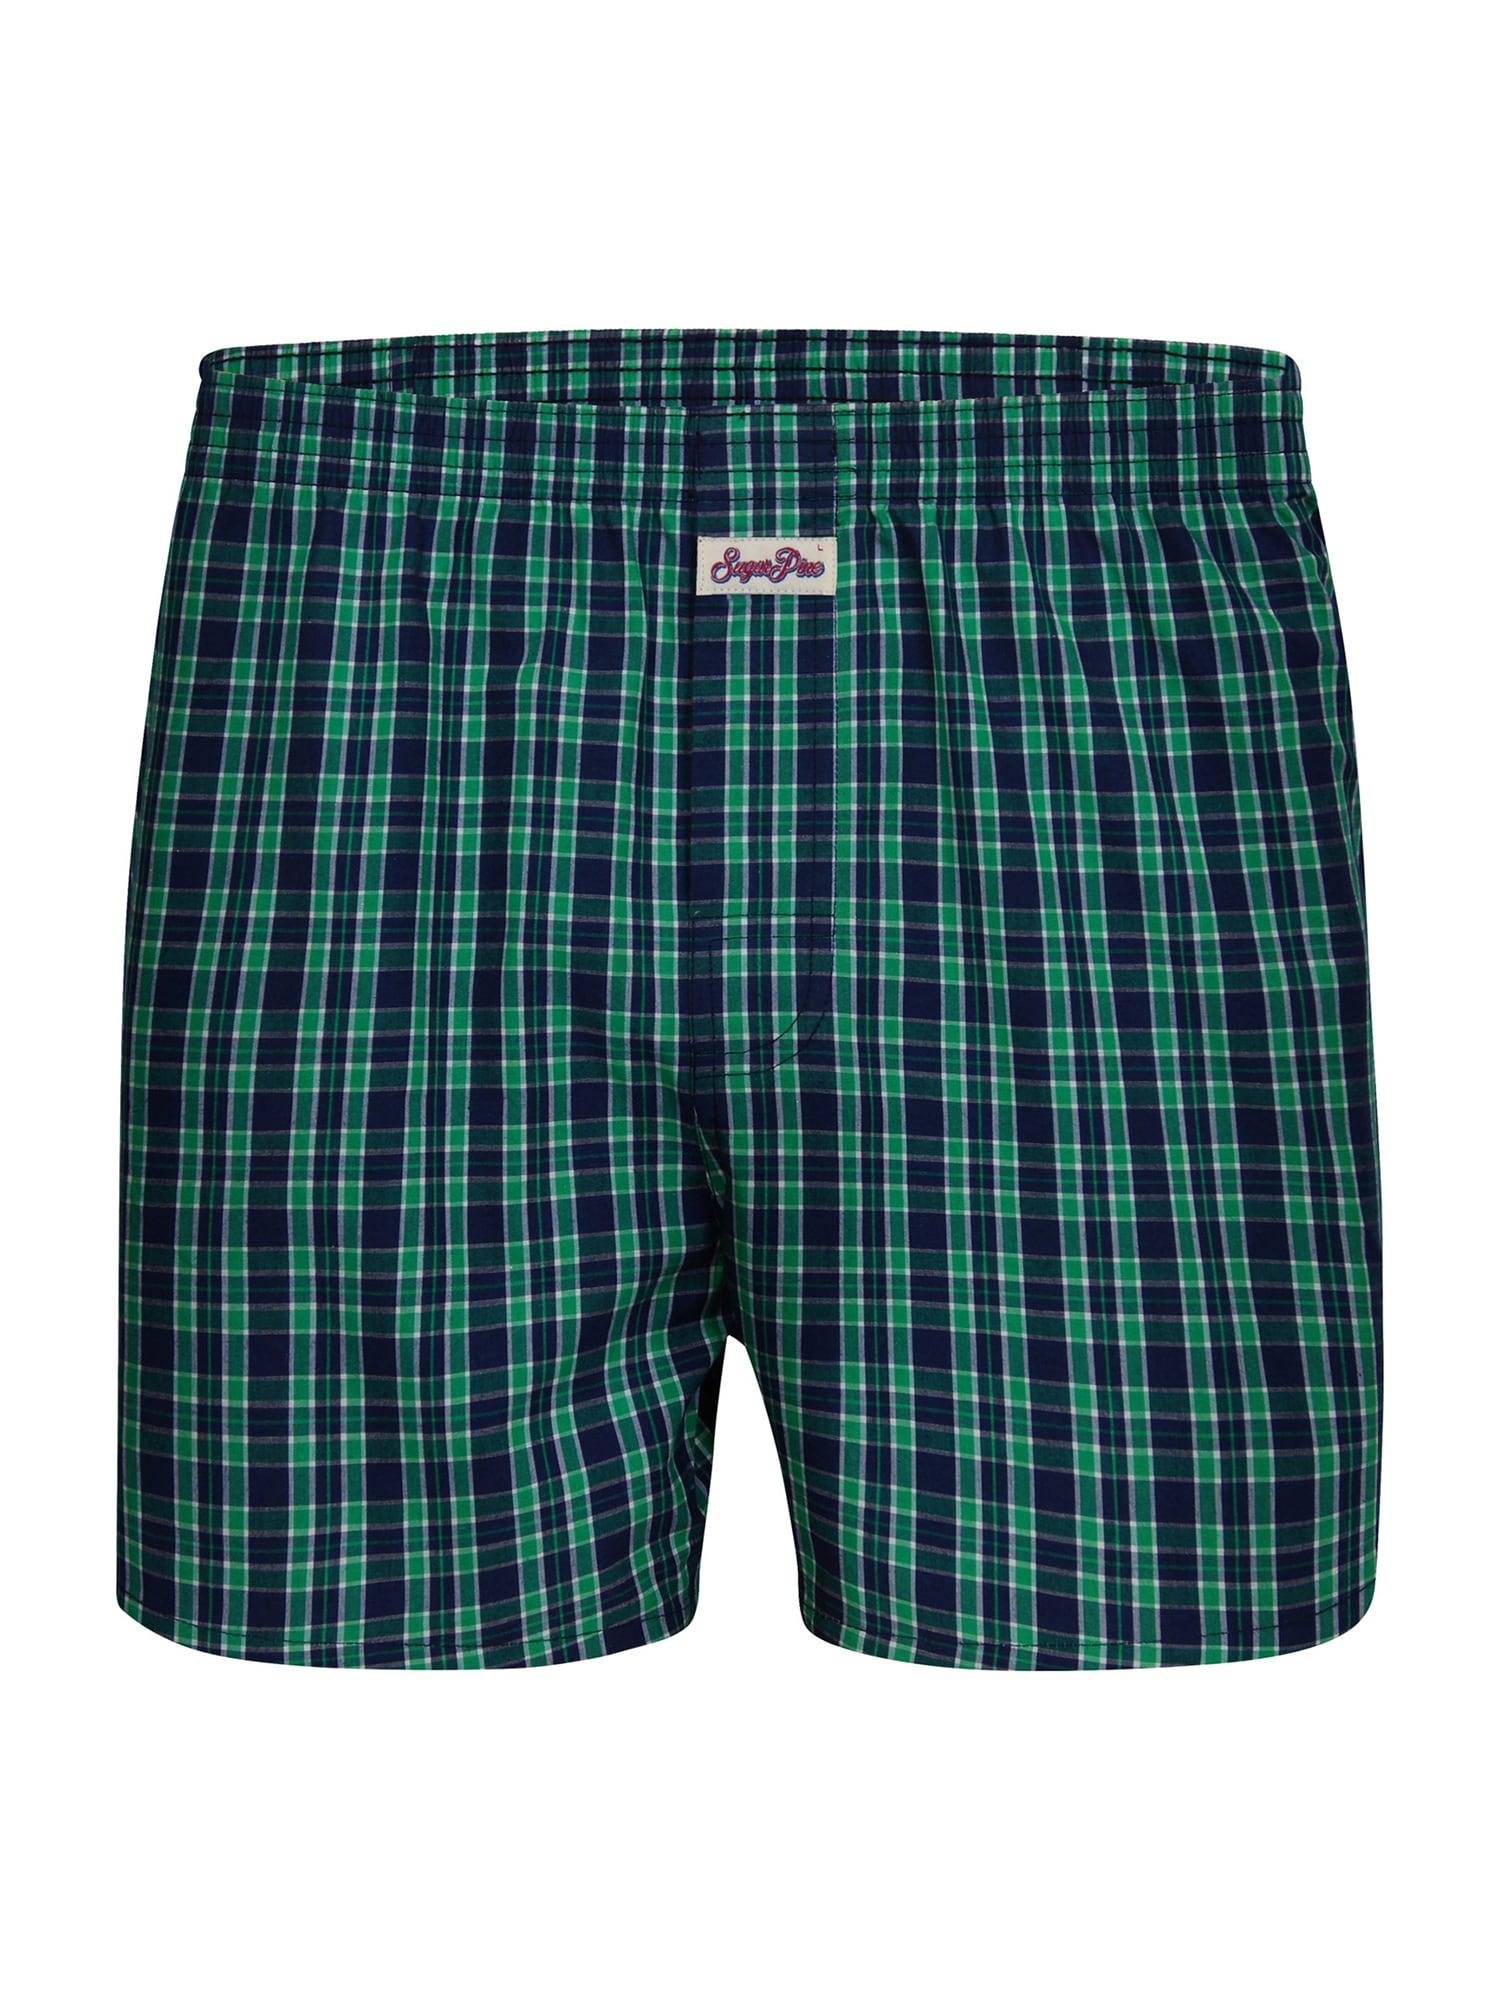 Boxershorts 'Classic Check' | Bekleidung > Wäsche > Boxershorts | Sugar Pine